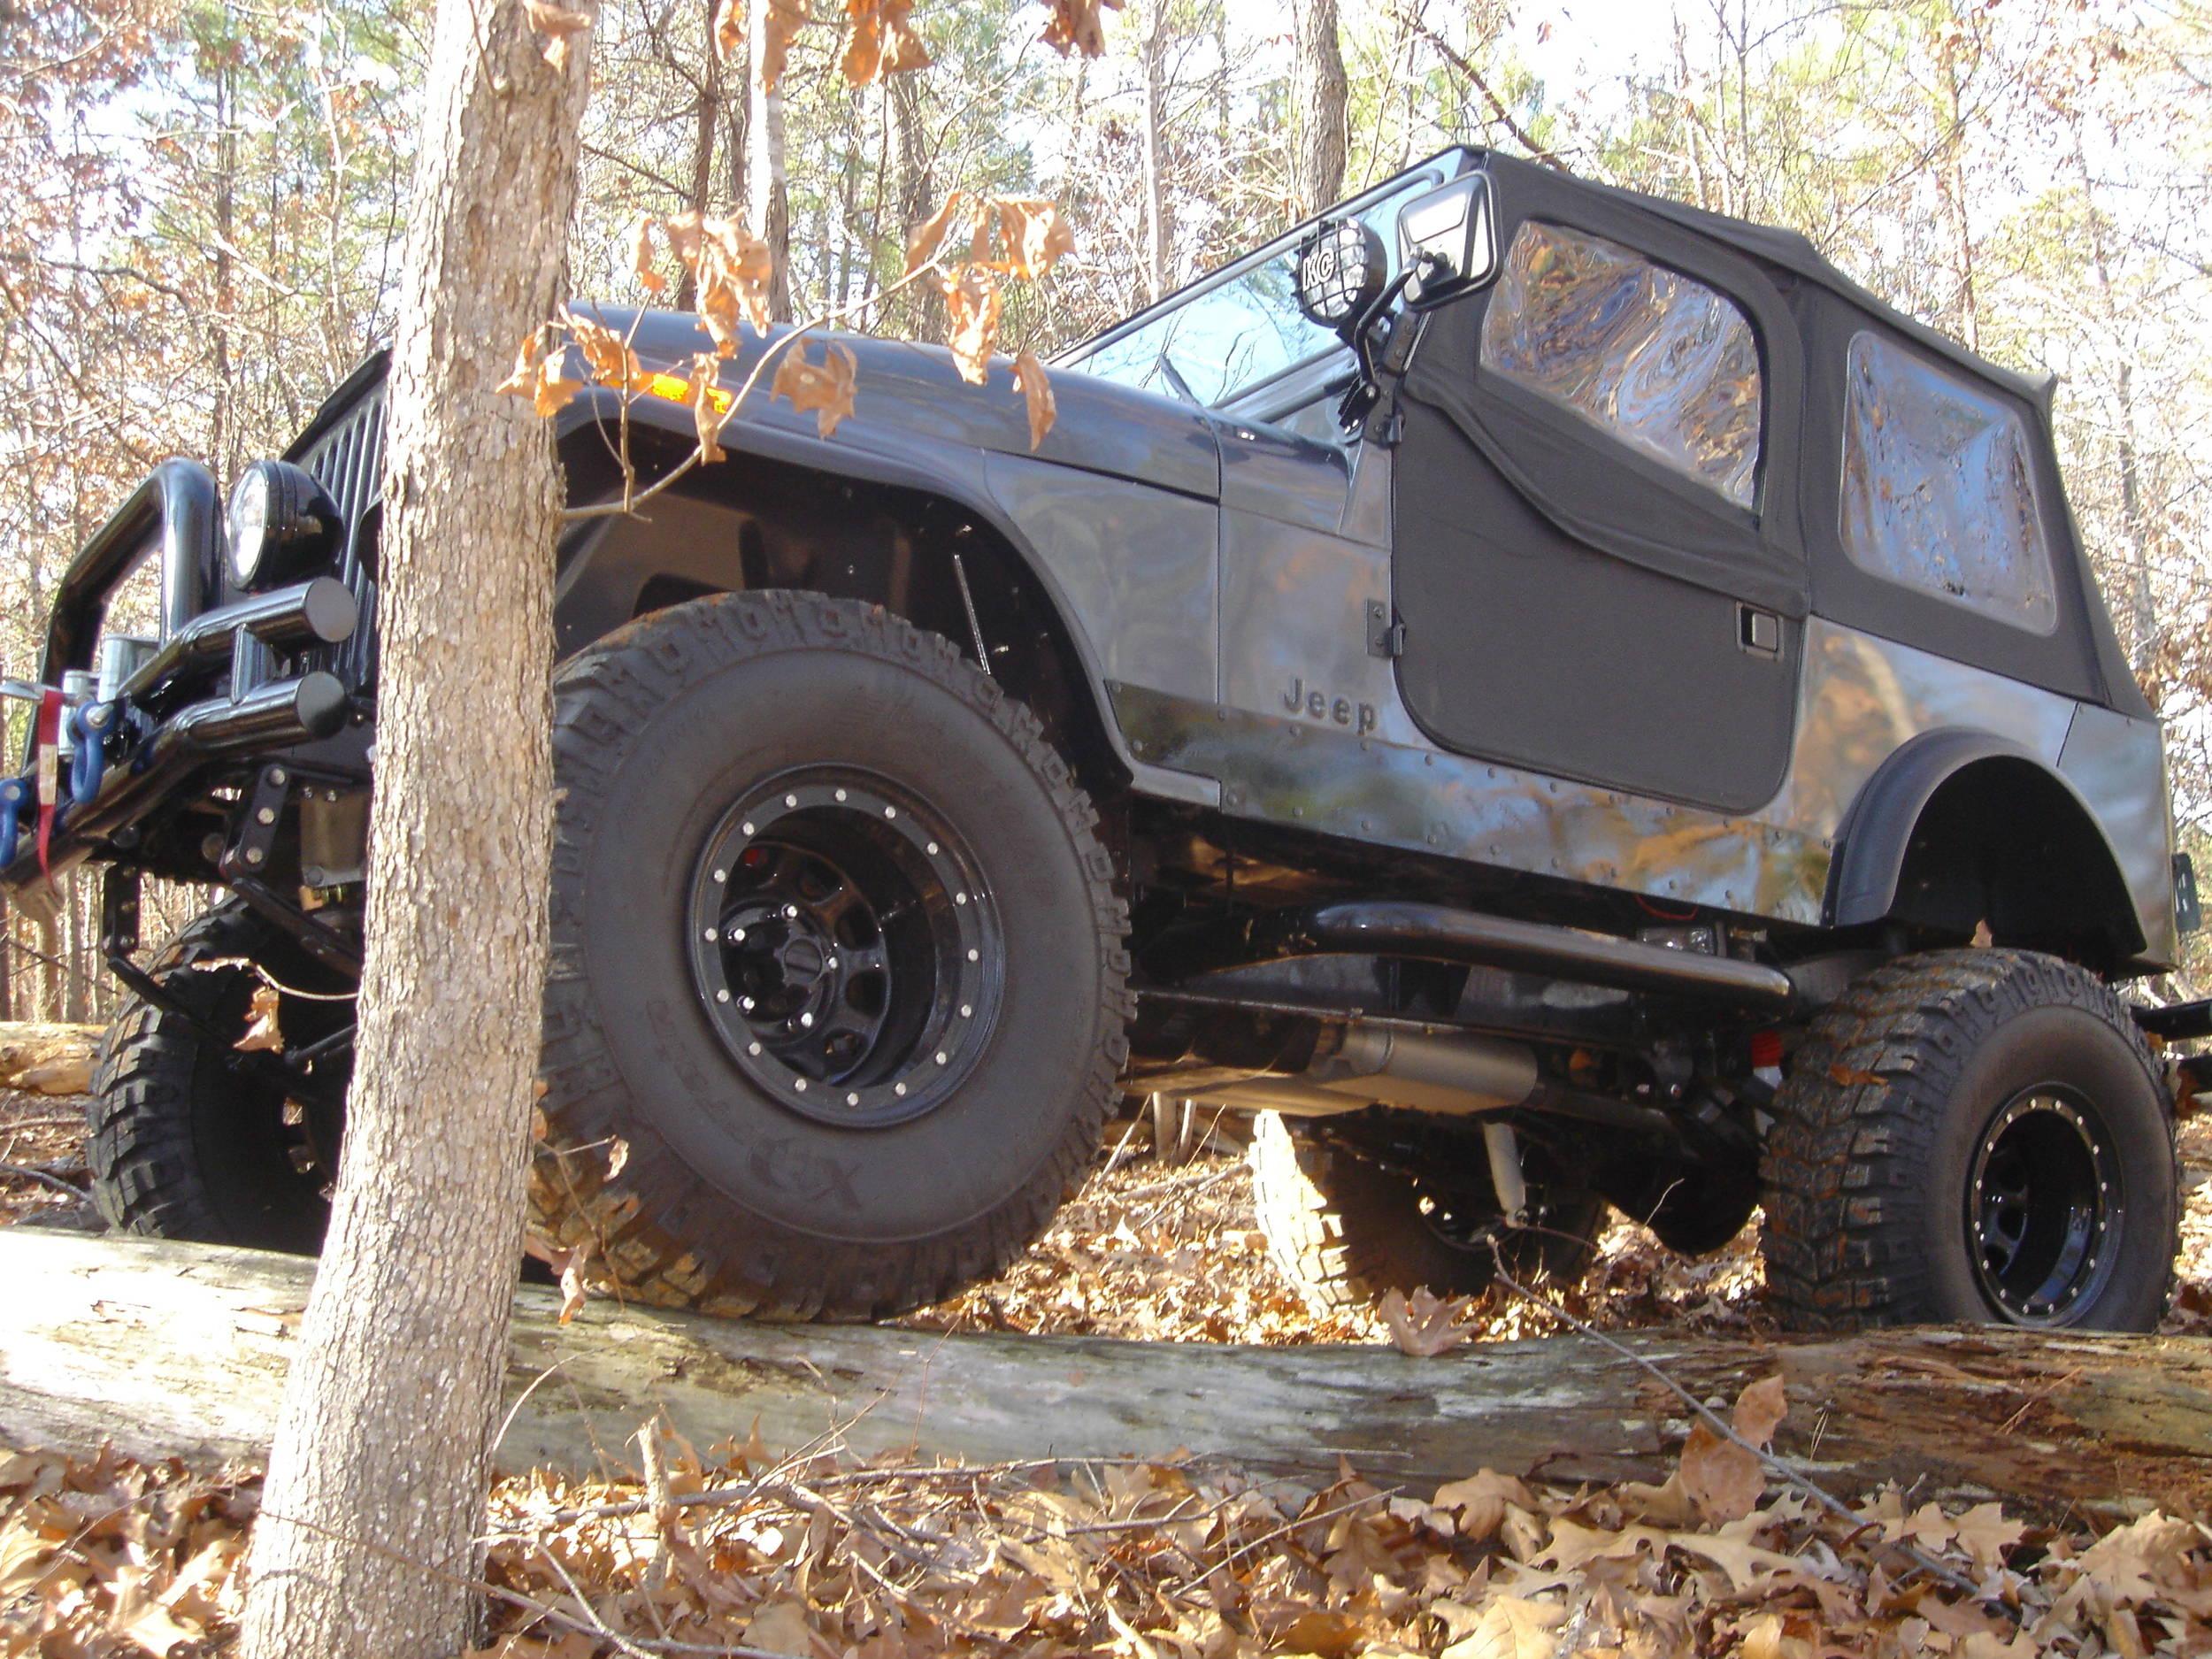 jeep_22_034.jpg